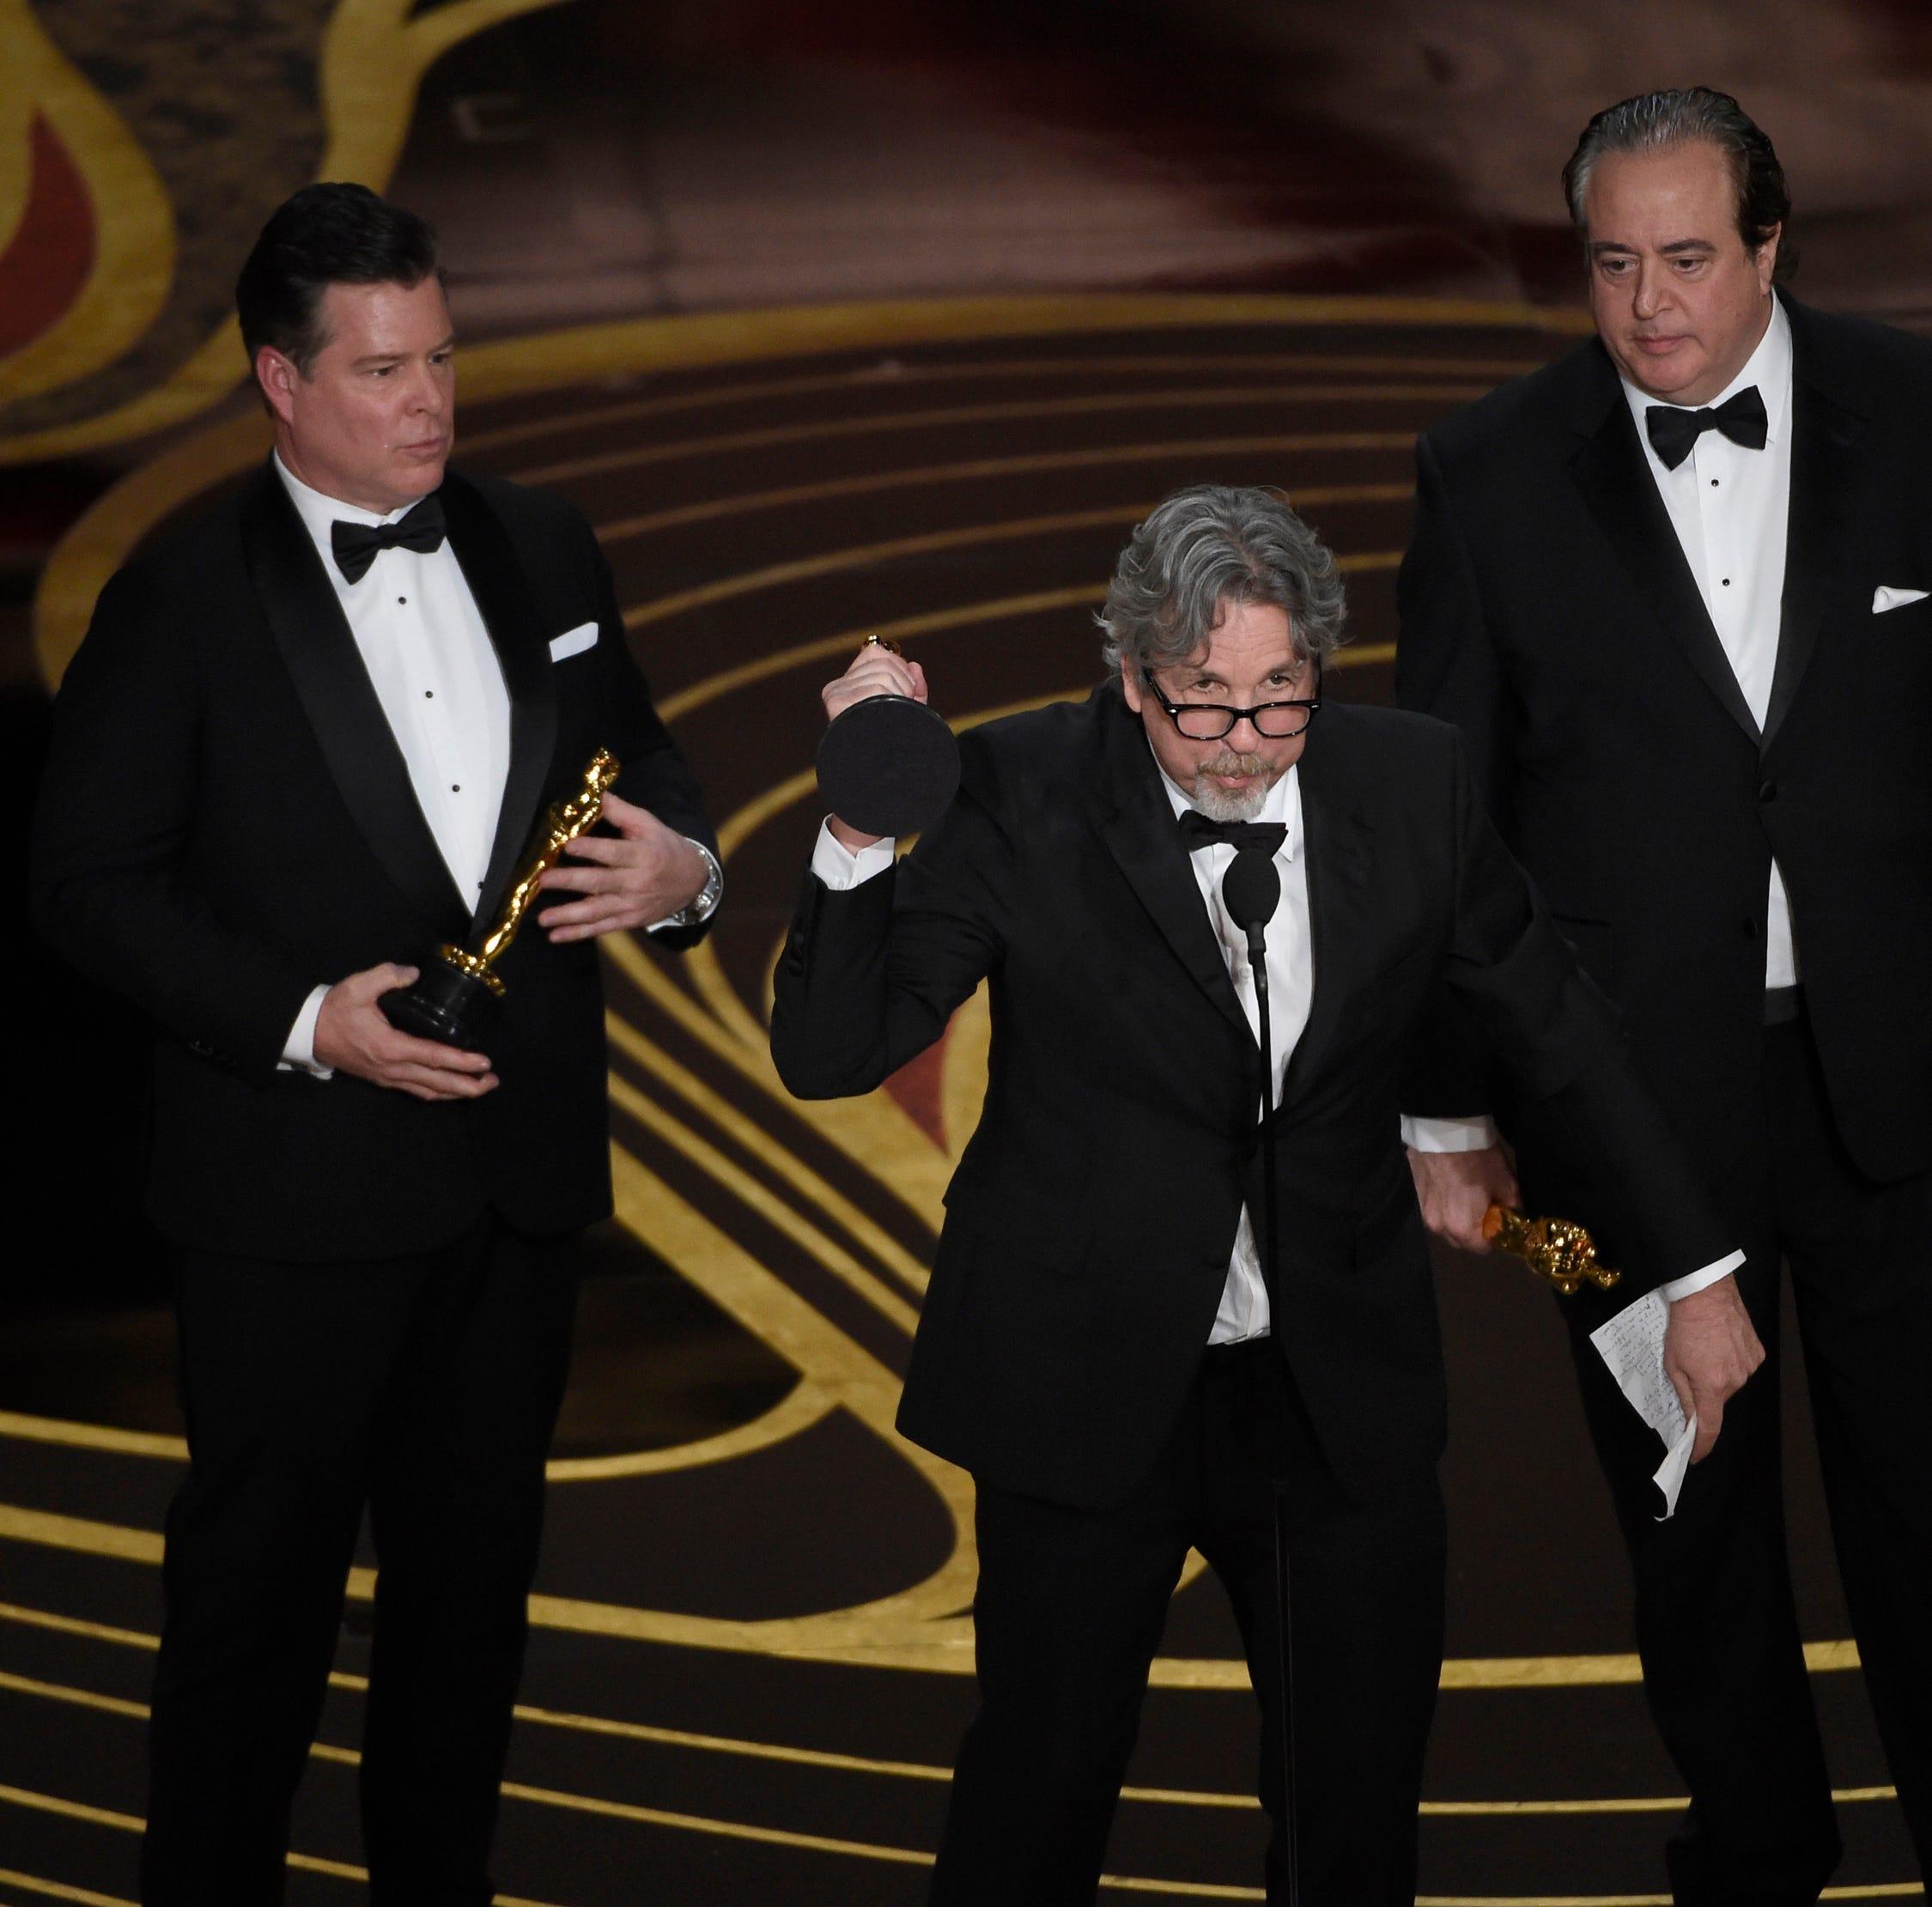 Shinola watches are 'saving Detroit,' Oscar winner says in speech